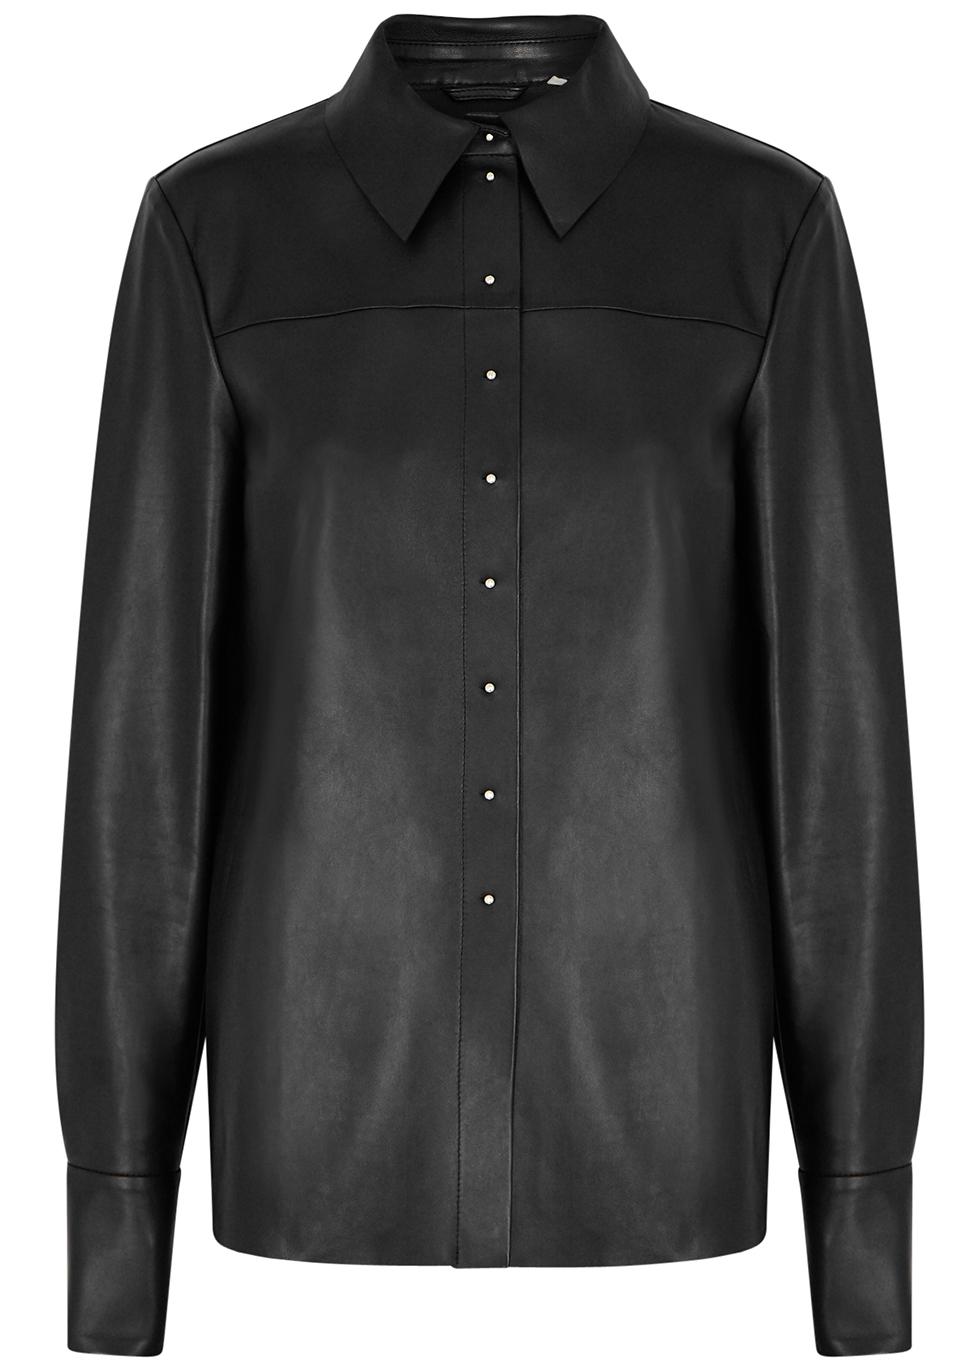 Ciurma black leather shirt